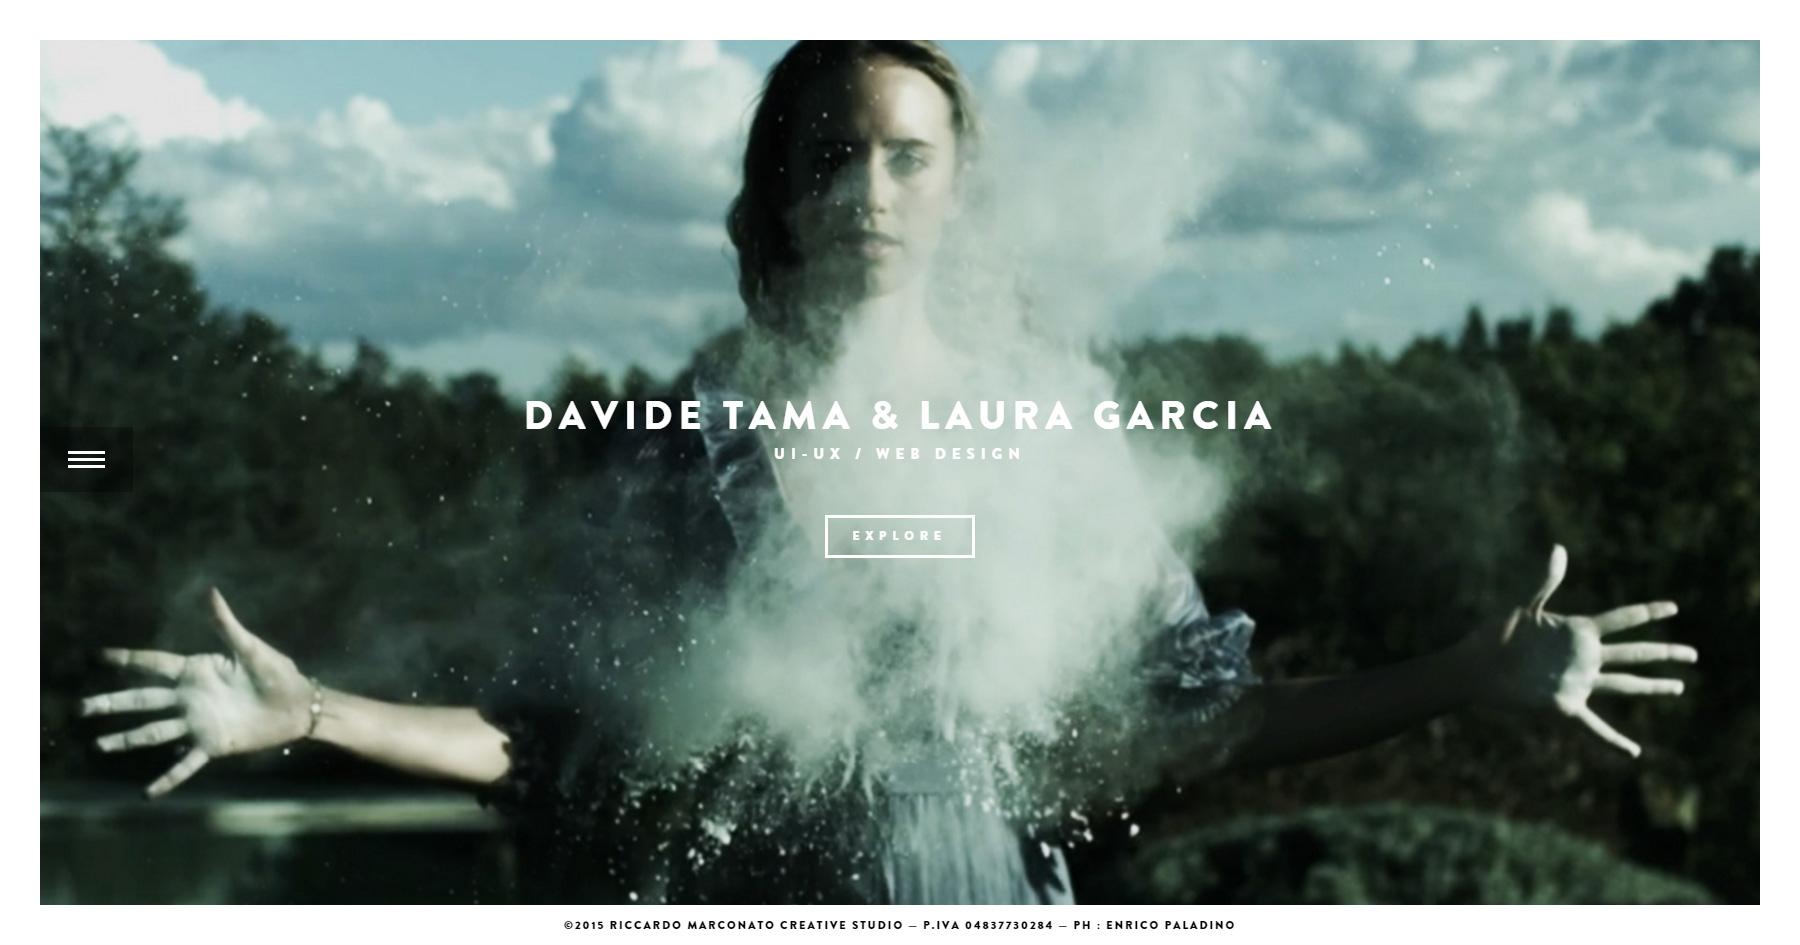 Riccardo Marconato Creative Studio - Website of the Day